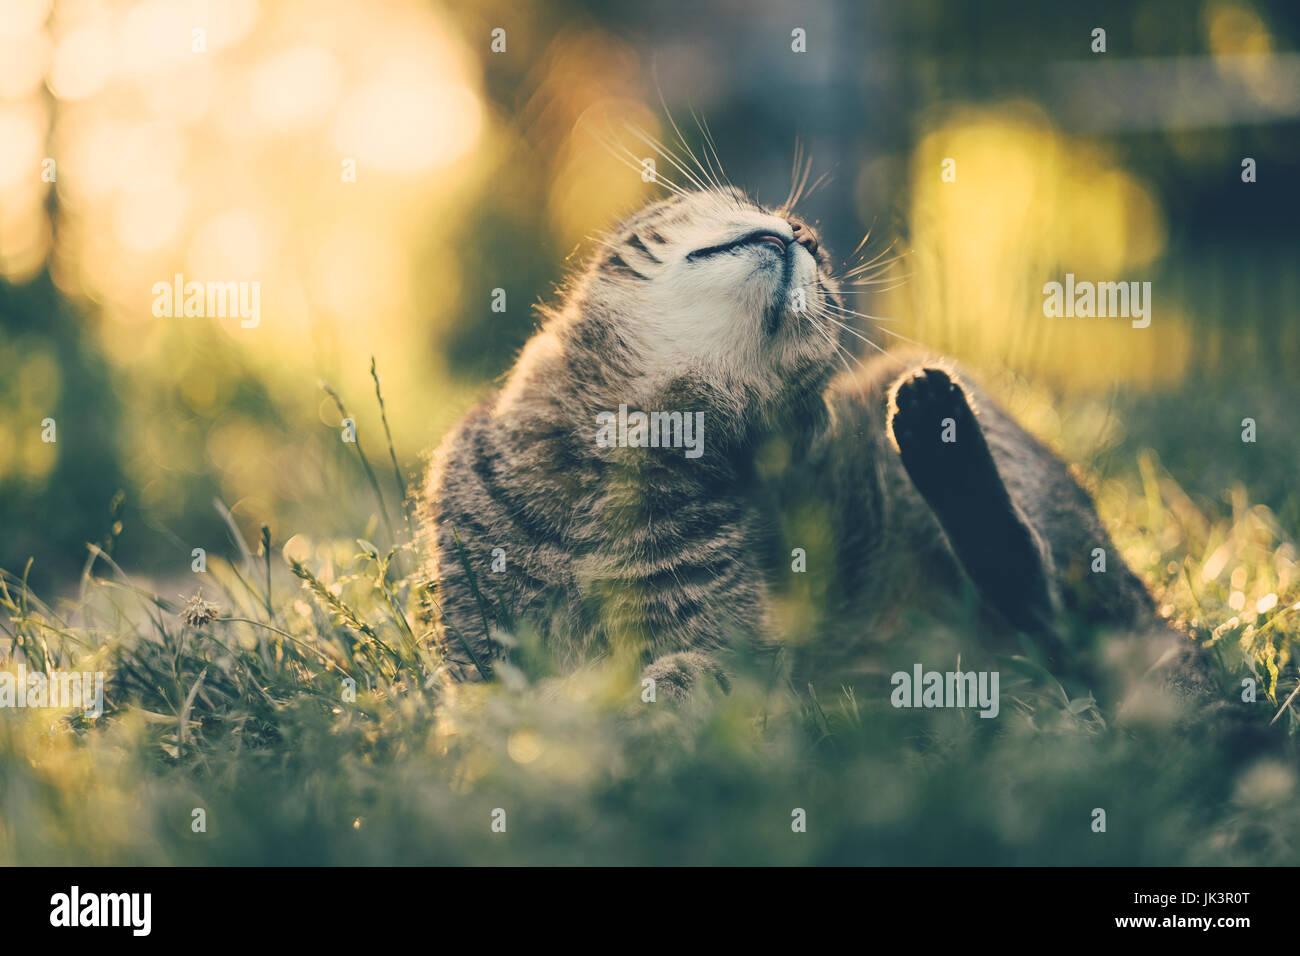 Flea cat - Stock Image